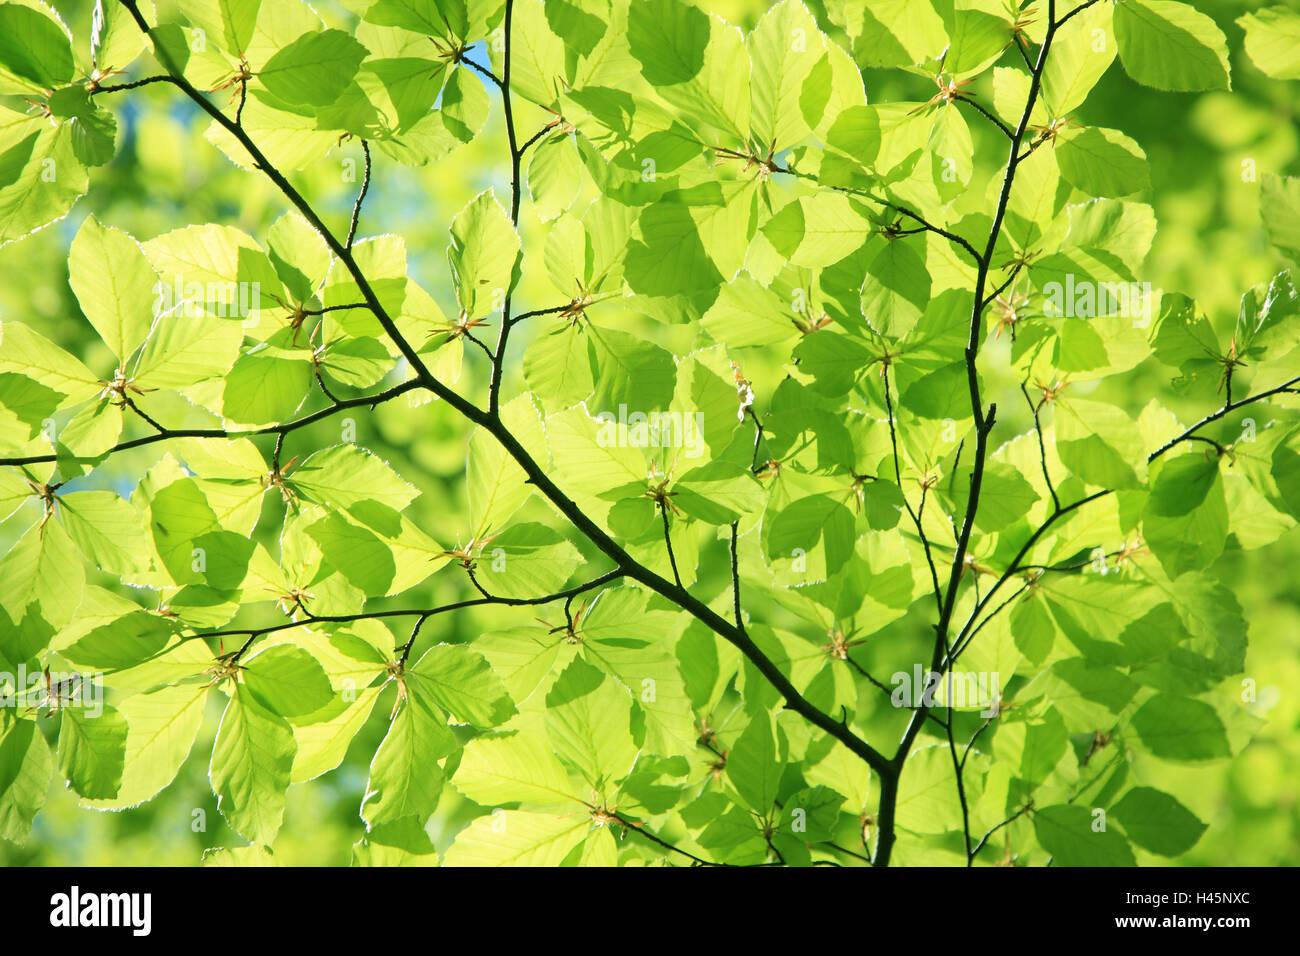 Hornbeam, Carpinus betulus, detail, from below, plant, tree, broad-leaved tree, twigs, branches, leaves, green, - Stock Image